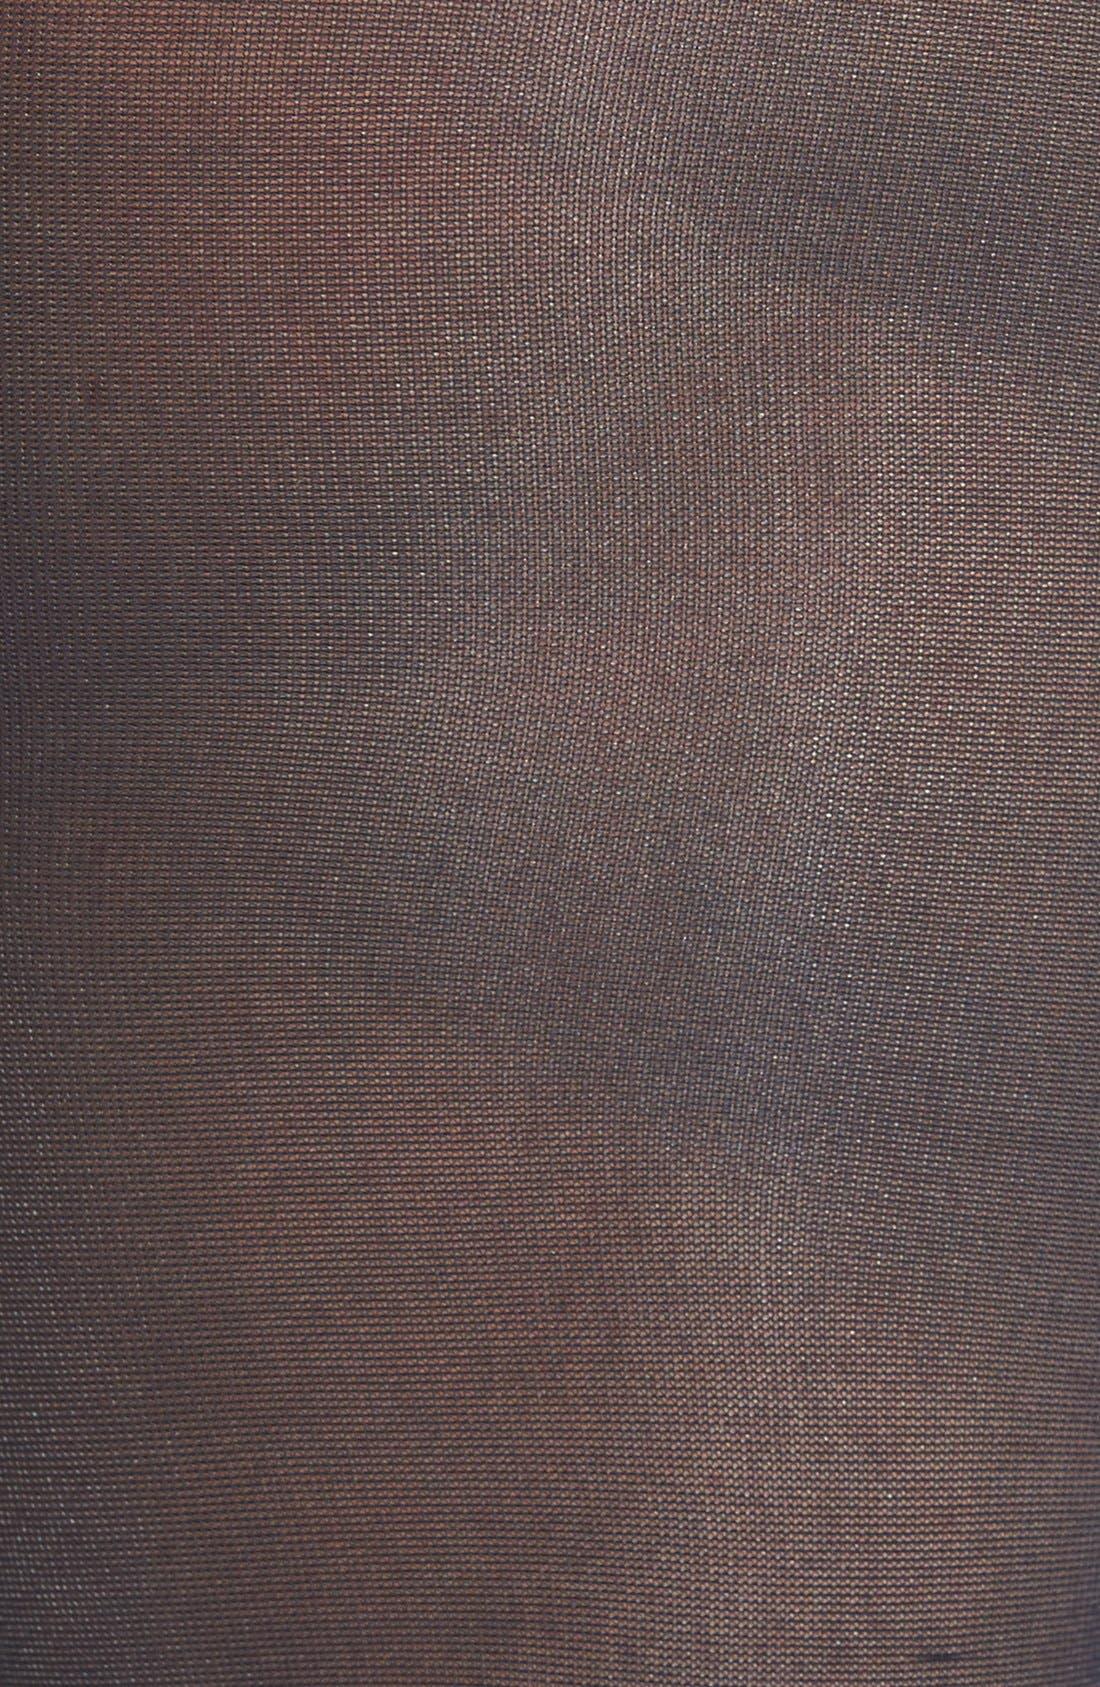 Alternate Image 2  - INSIGNIA by SIGVARIS Knee High Trouser Socks